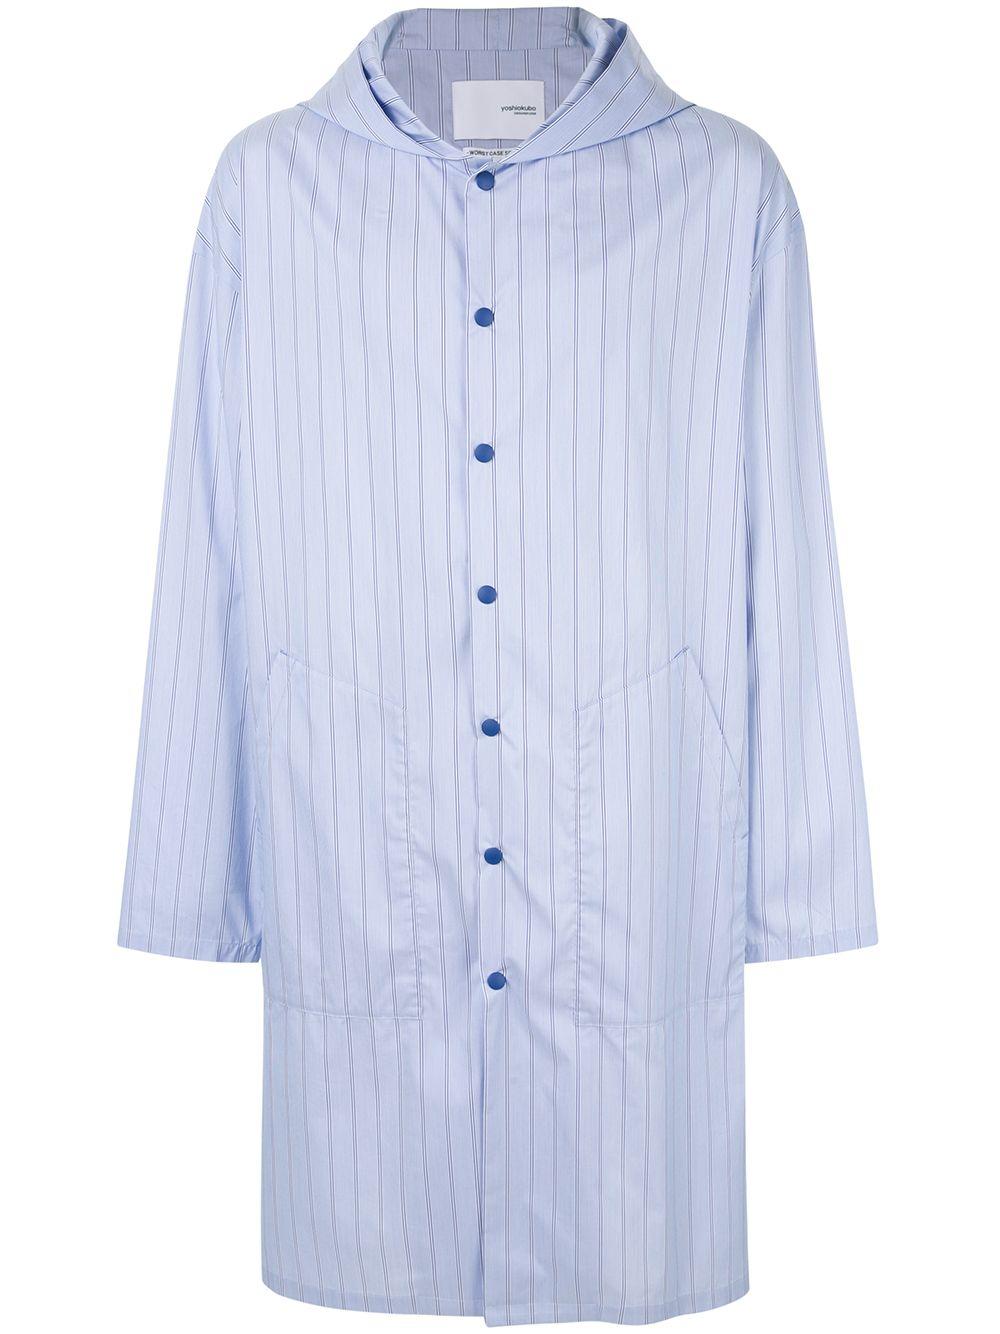 Yoshio Kubo | Yoshiokubo пальто-рубашка с принтом | Clouty